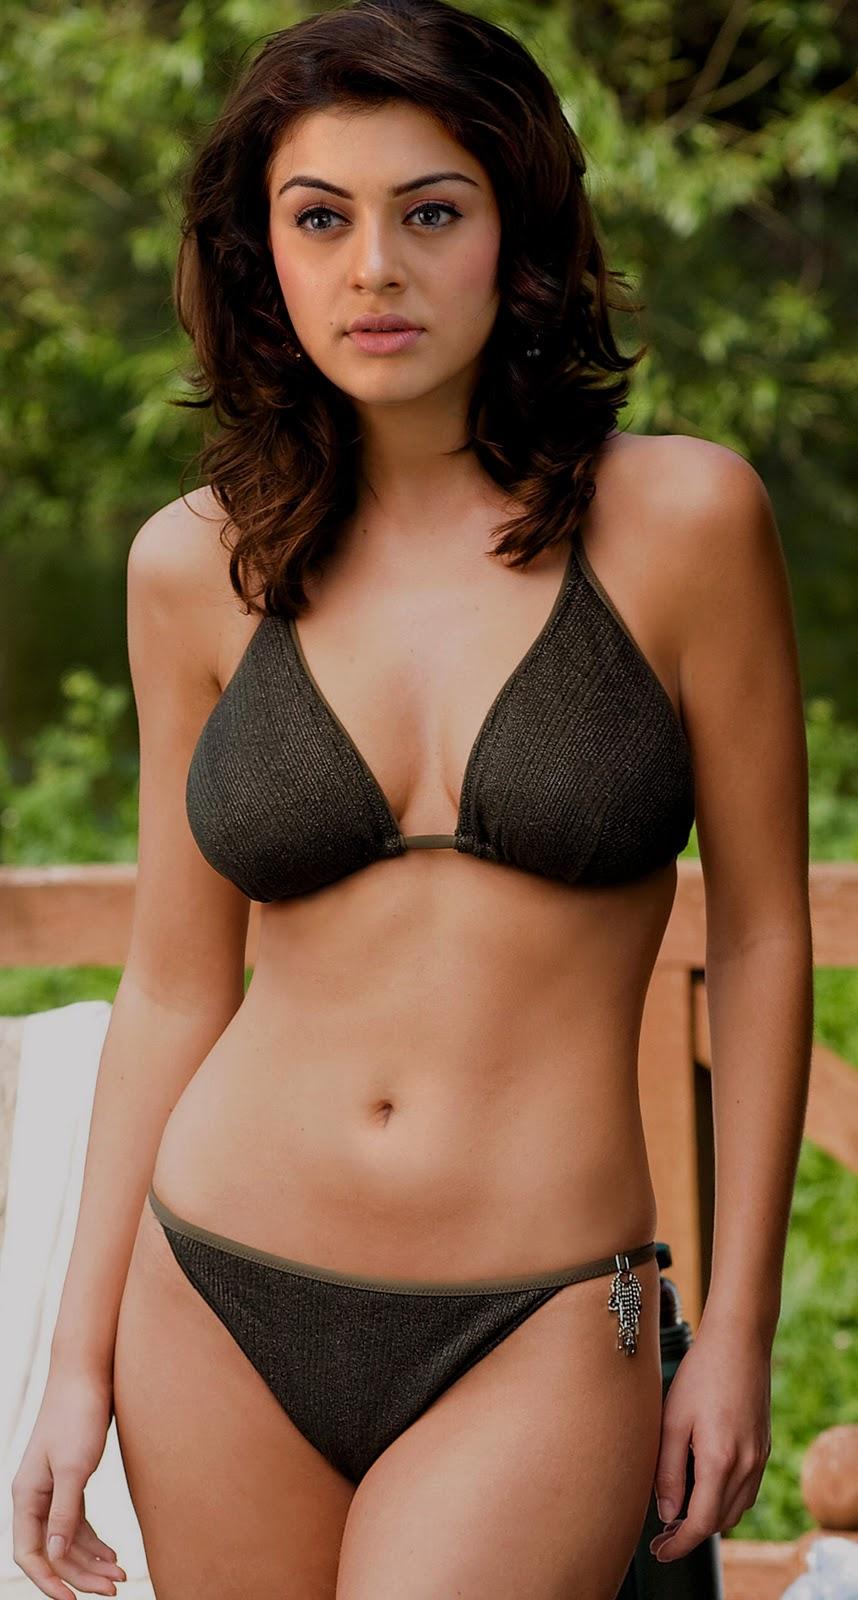 Katrina Kaif Cute Face Hd Wallpapers 858x1600 Source Mirror